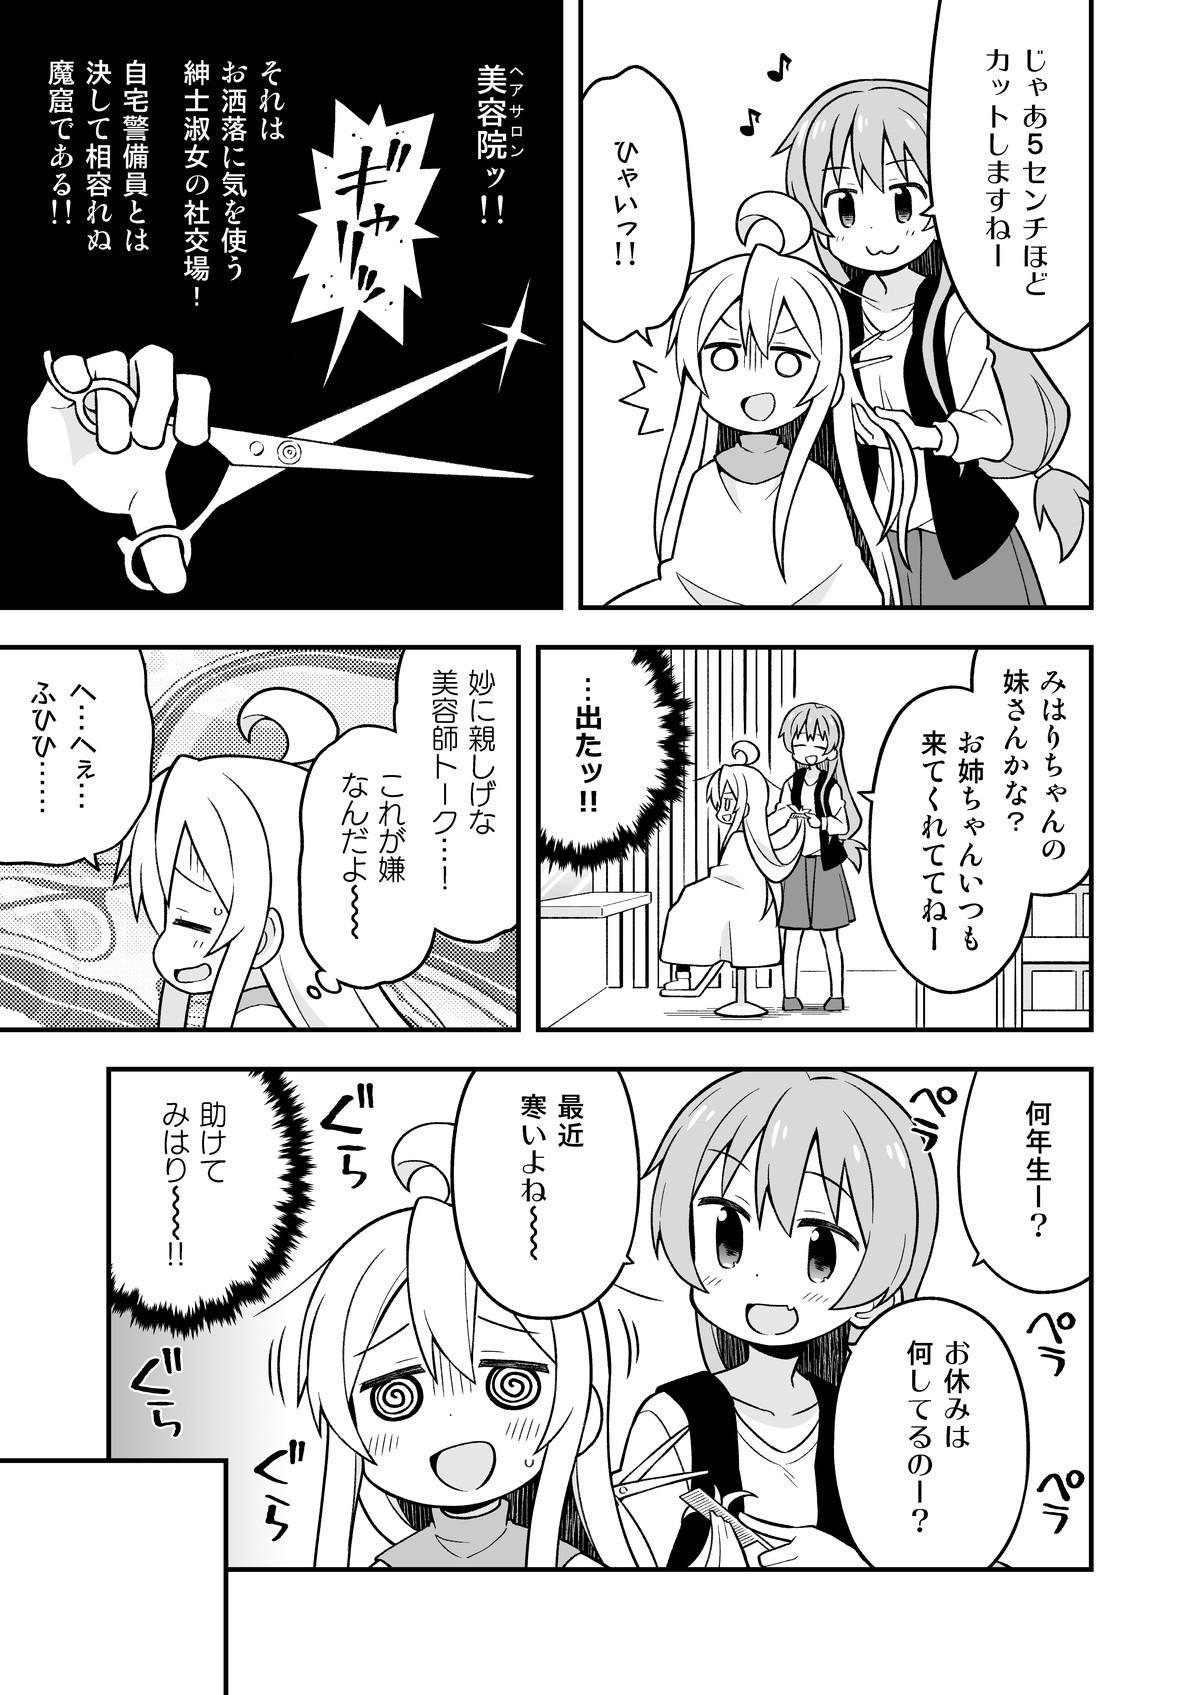 Onii-chan wa Oshimai! 6 5